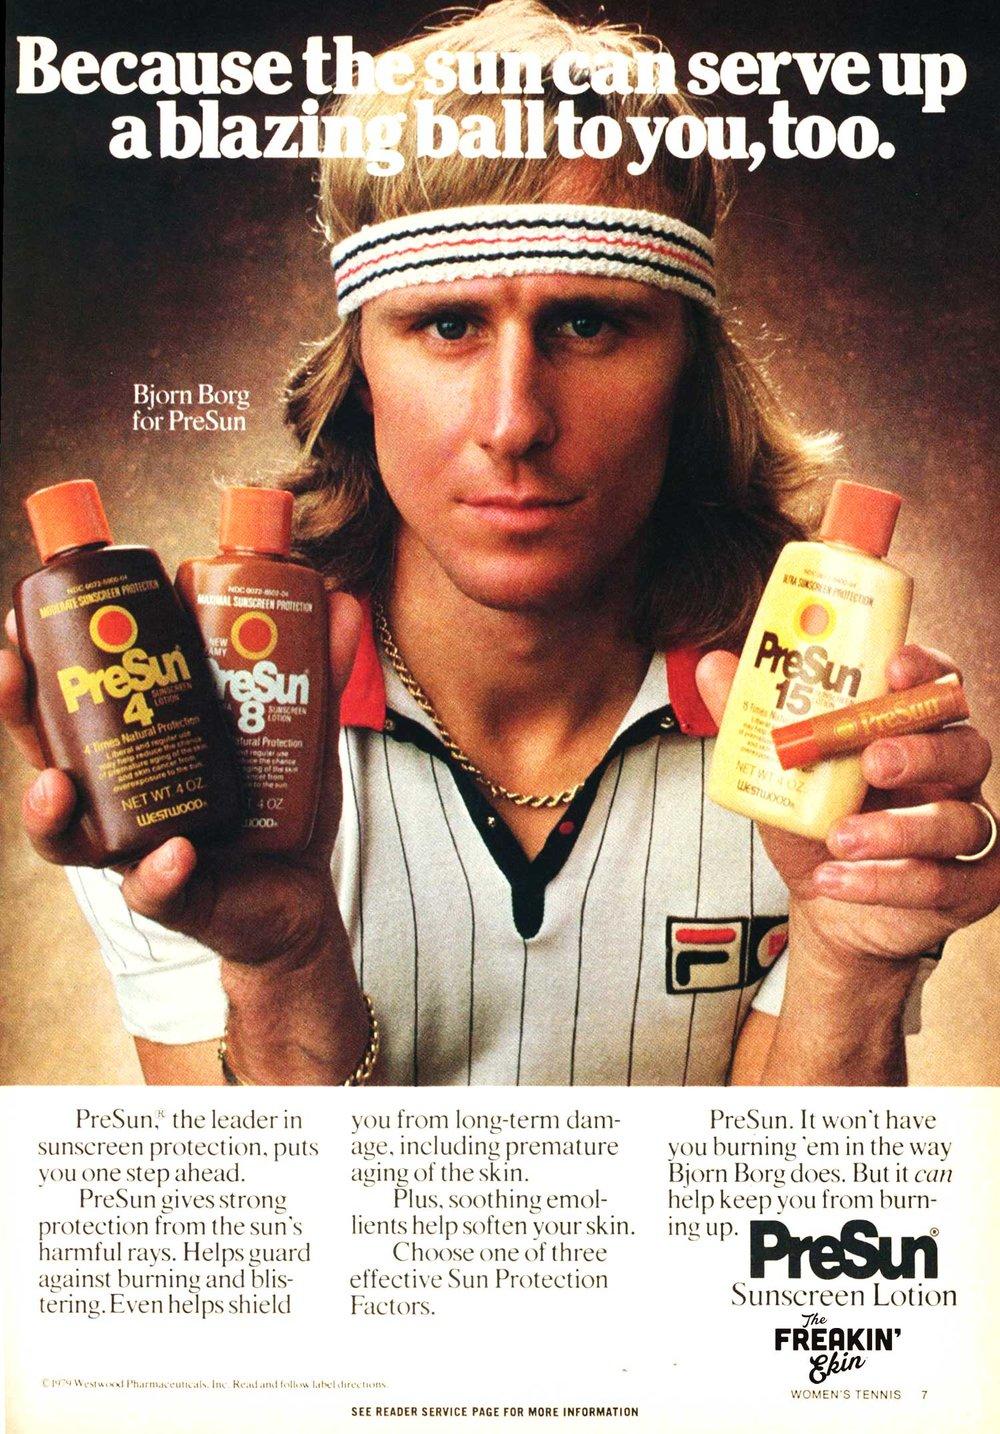 Bjorn Borg 1980 Richie Tenenbaum Wes Anderson vintage ad   The Freakin  Ekin 536146125e2